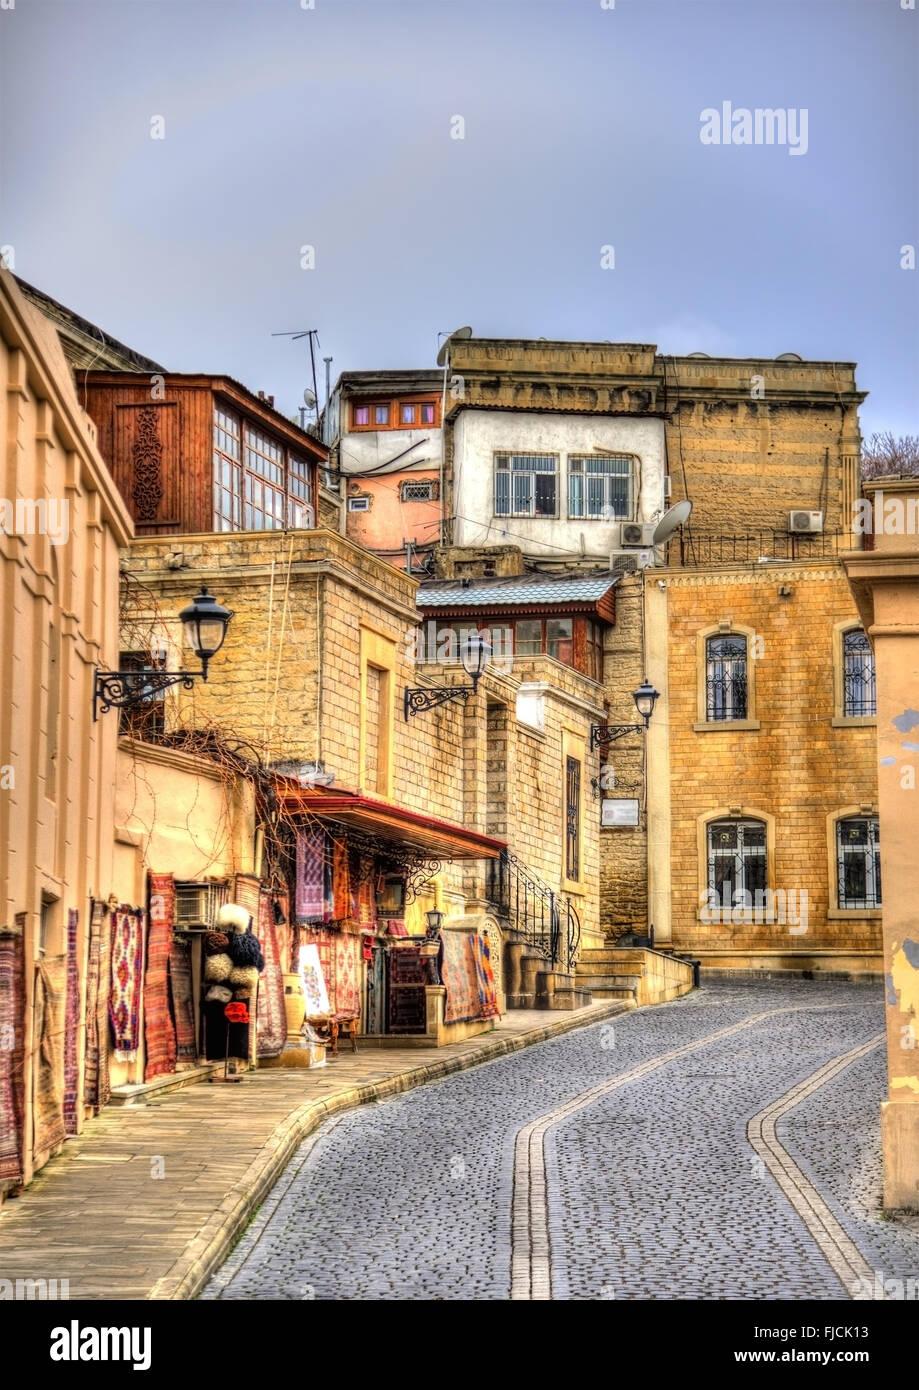 Icheri Sheher, the Old Town of Baku - Stock Image